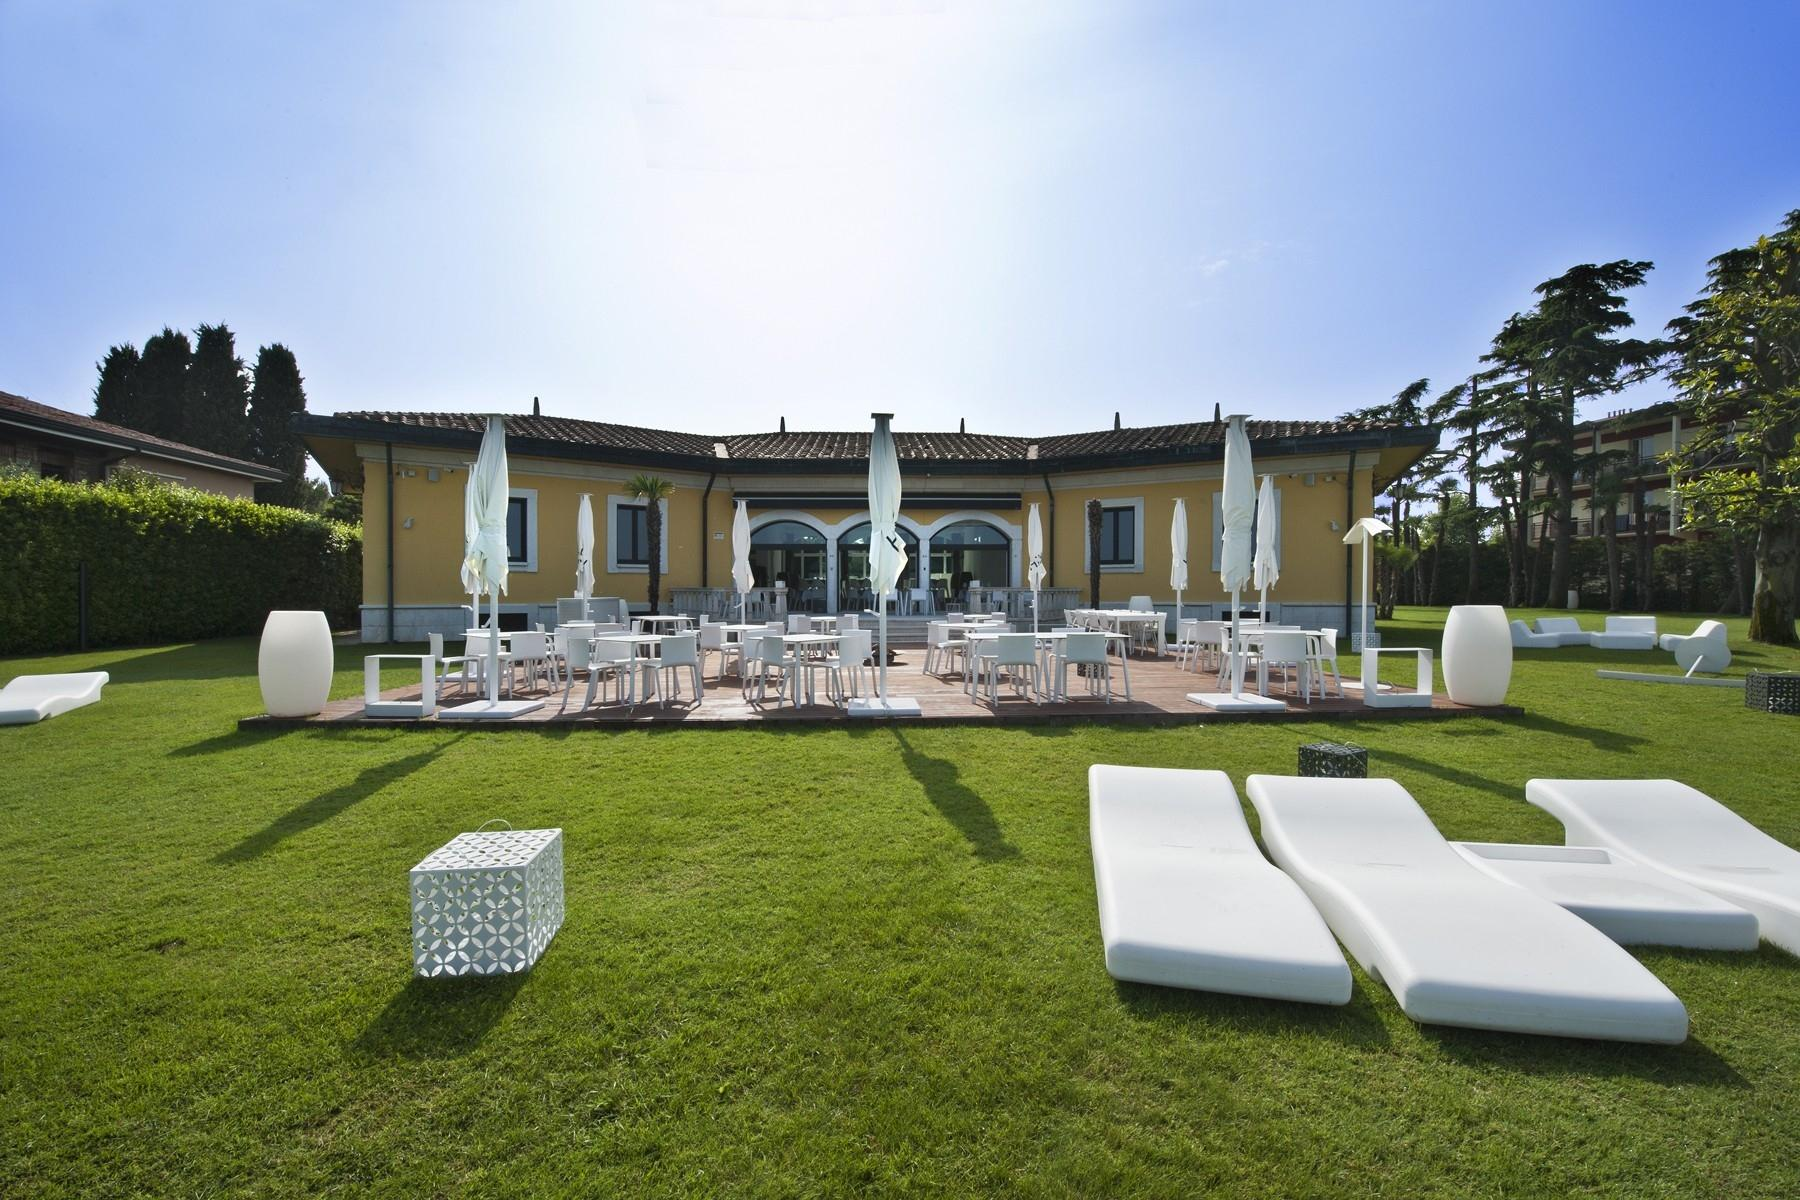 Villa unica pied dans l'eau con spiaggia e pontile a Sirmione - 4